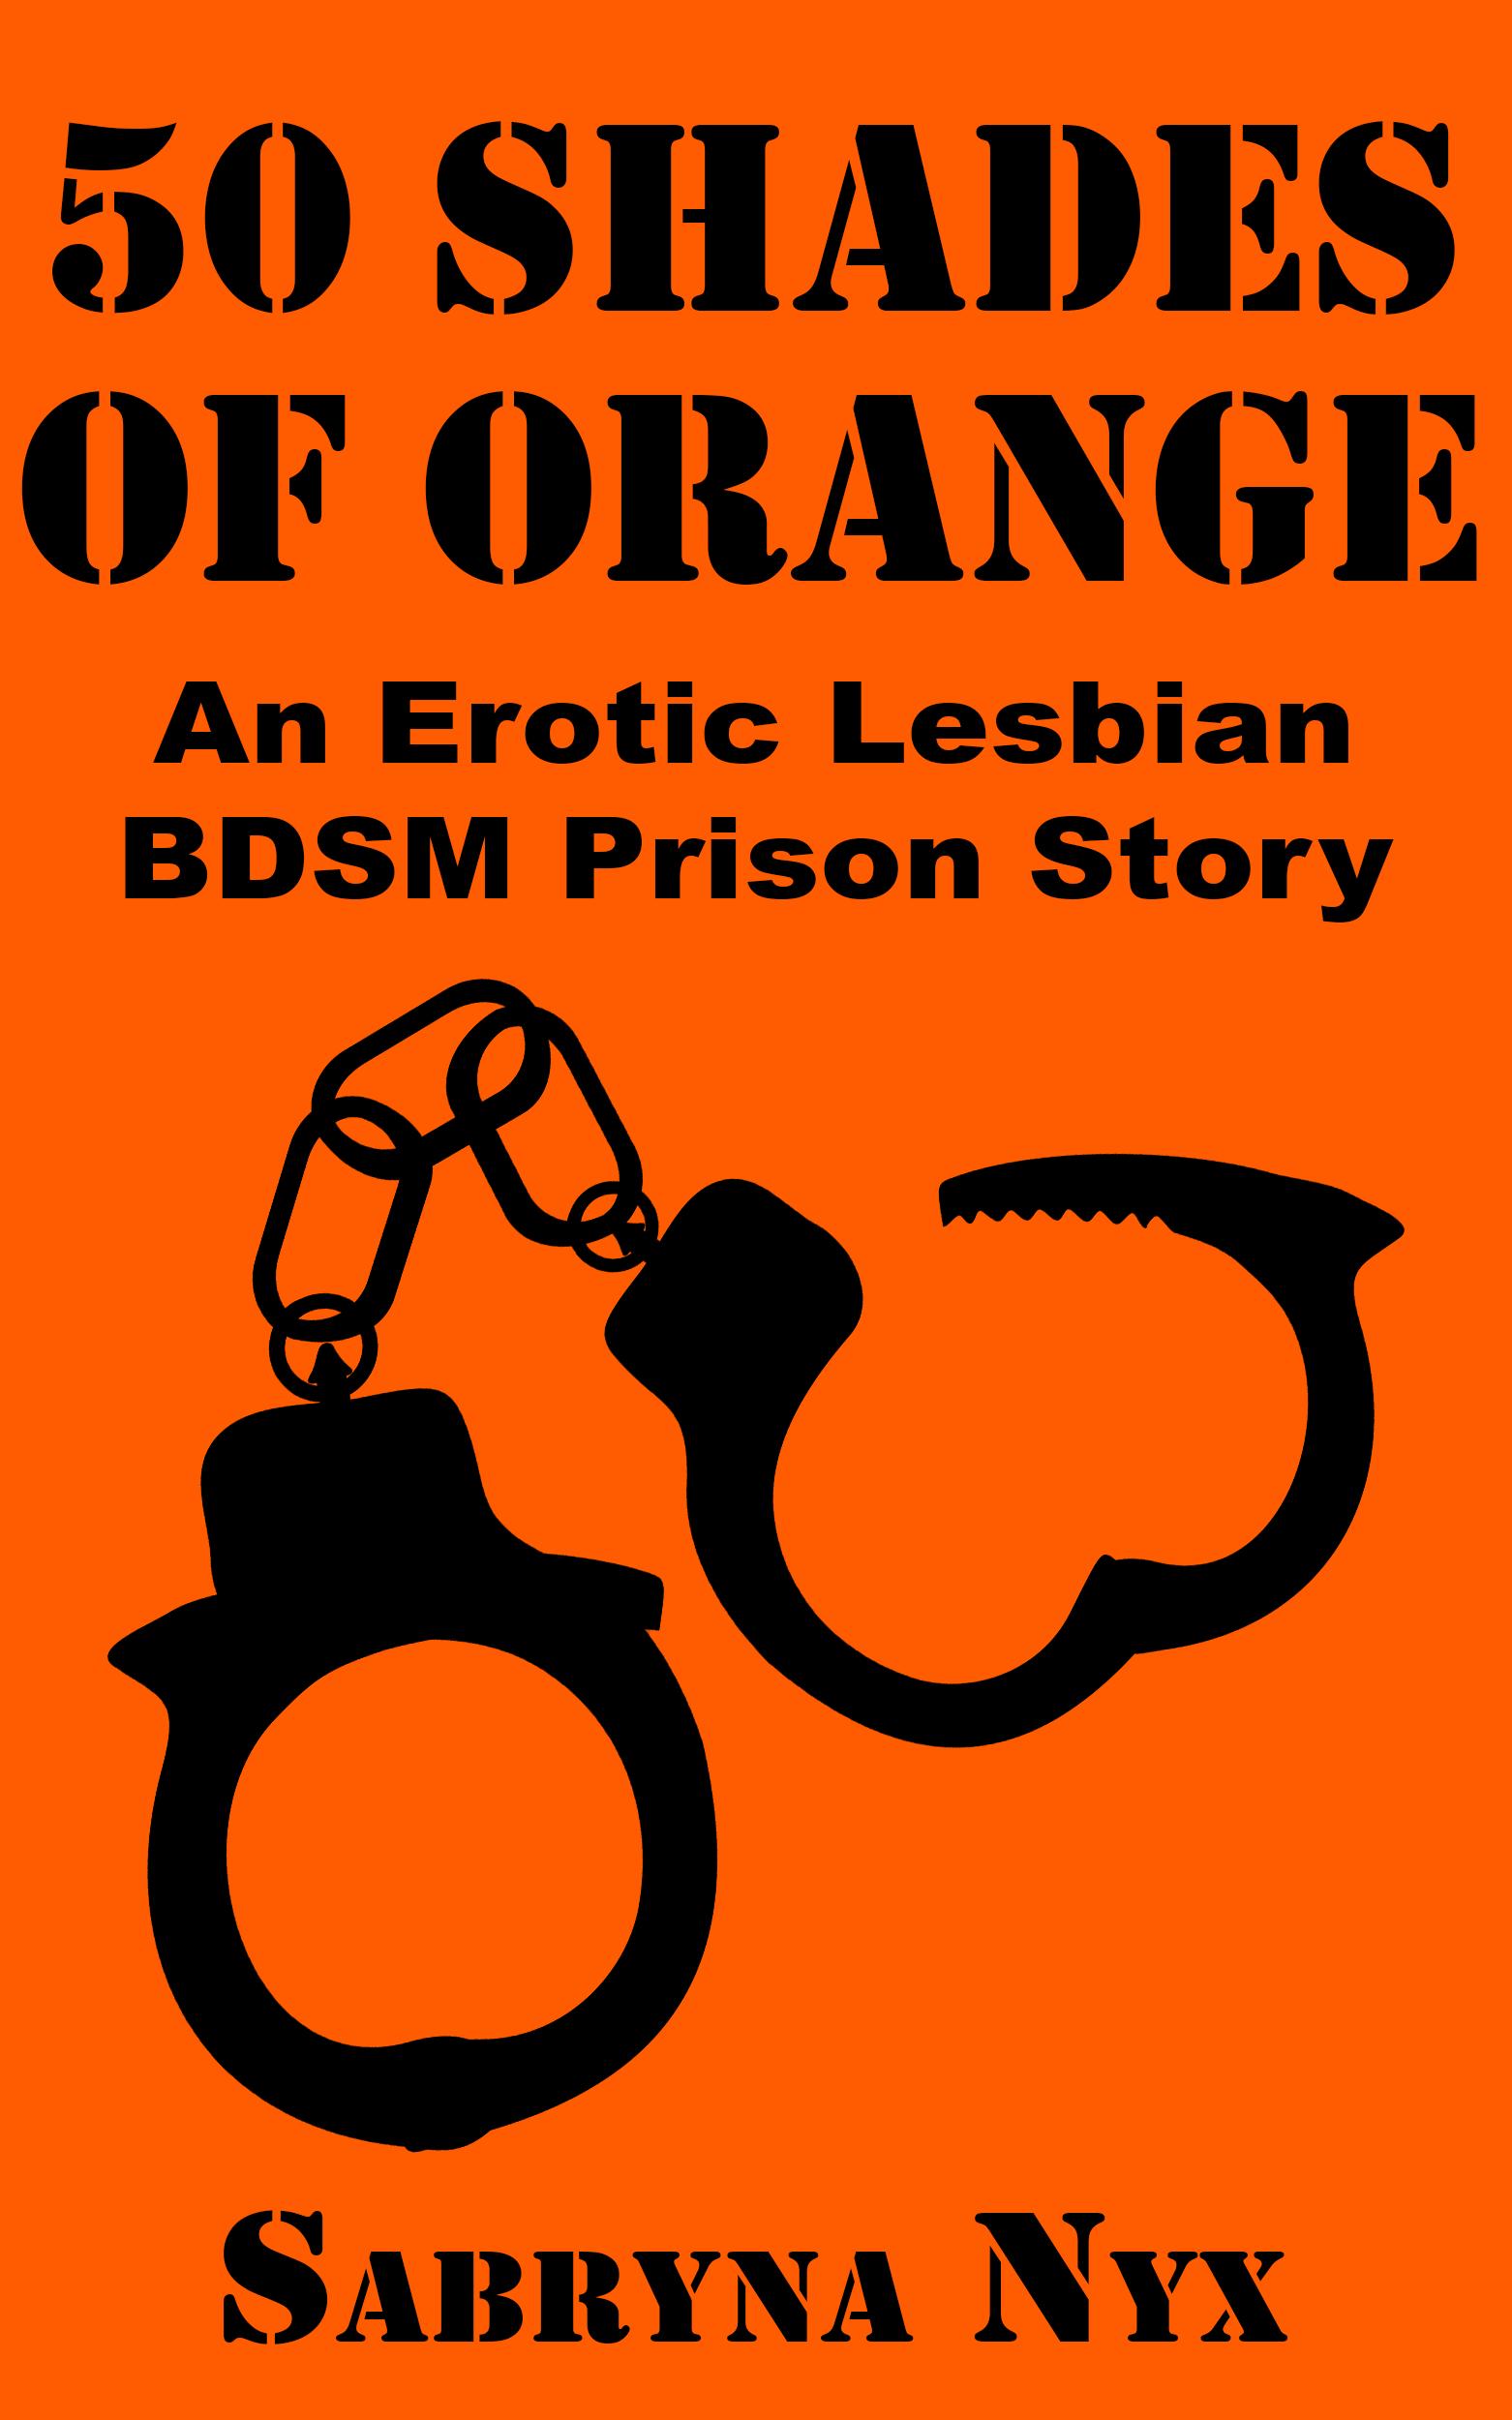 Lesbian erotic prison stories